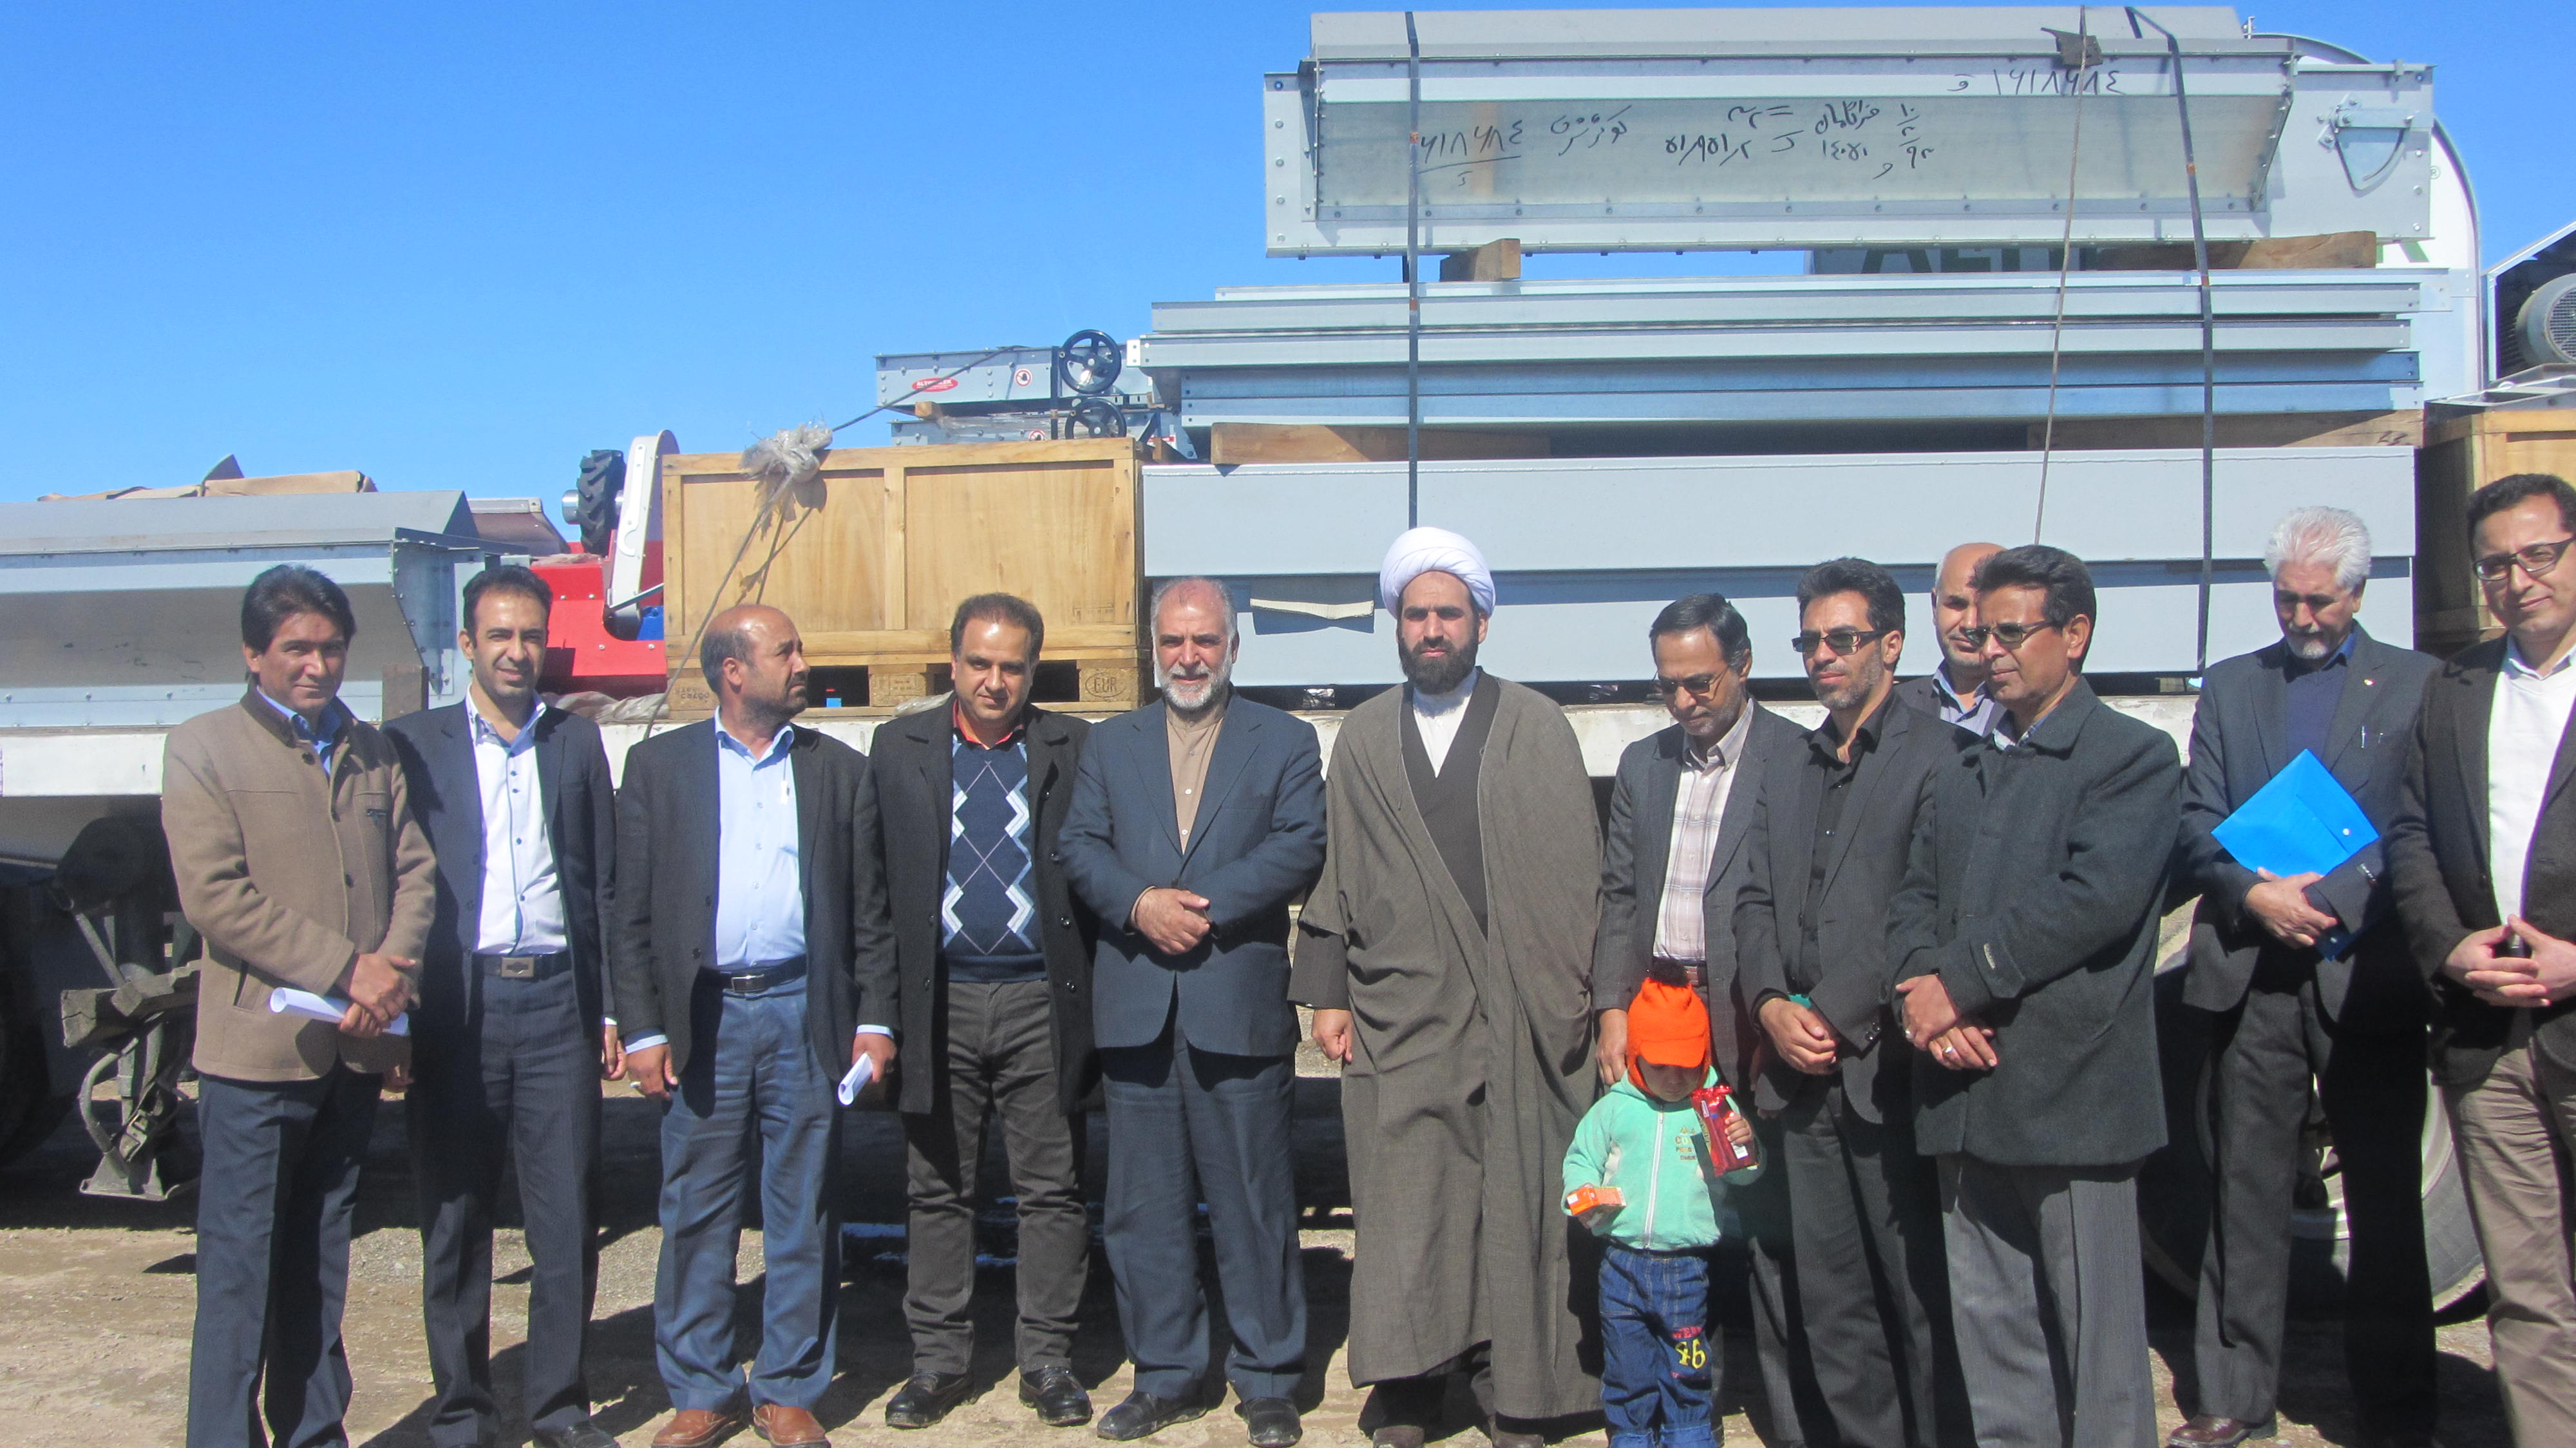 مراسم سخنراني حجت الاسلام مهدي زاده در اغاز عمليات و نصب تجهيزات سيلوي گندم